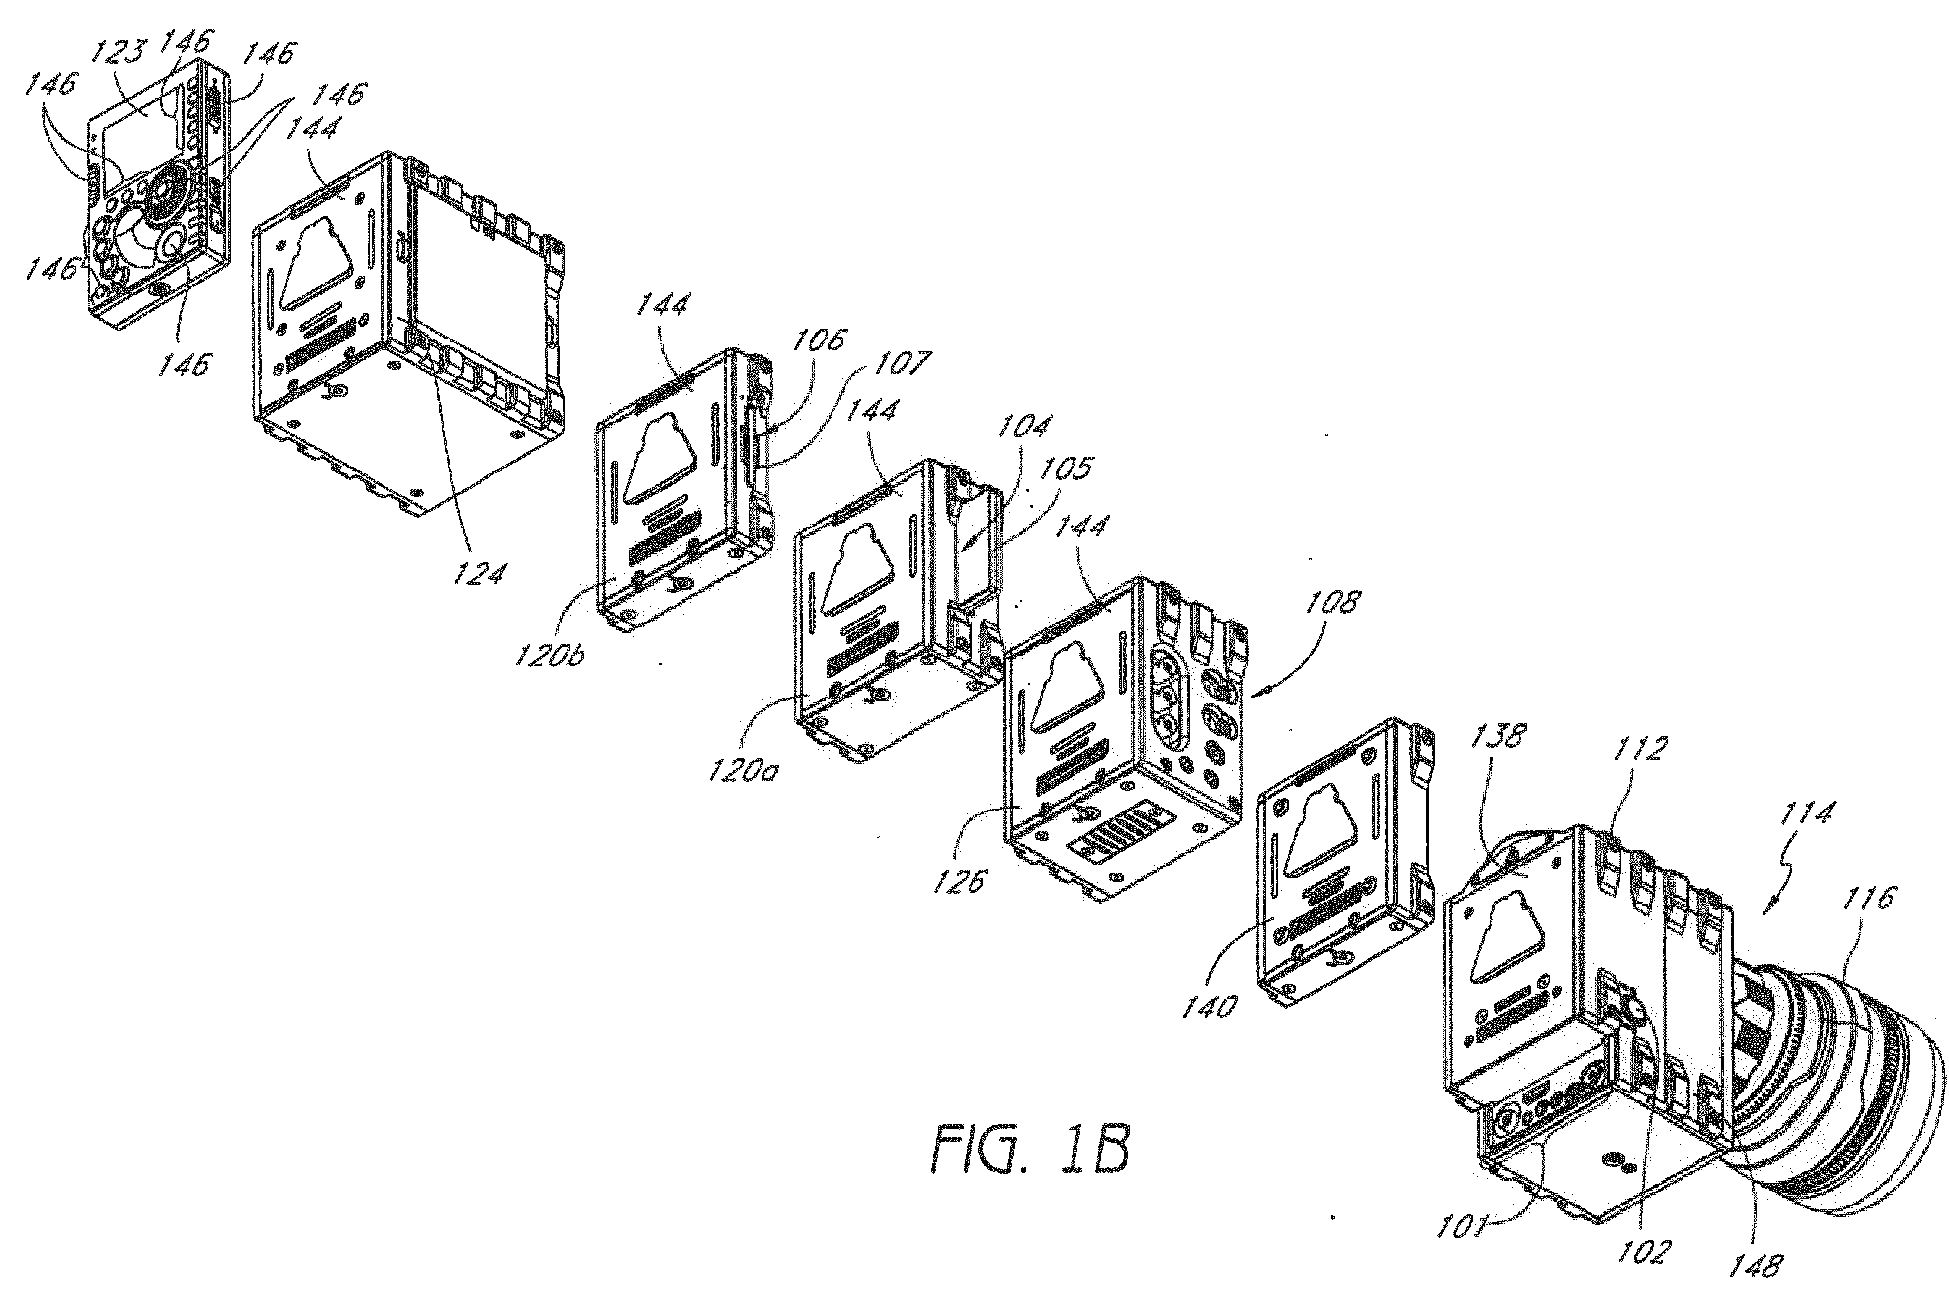 EP2645164A1 - Modular digital camera - Google Patents